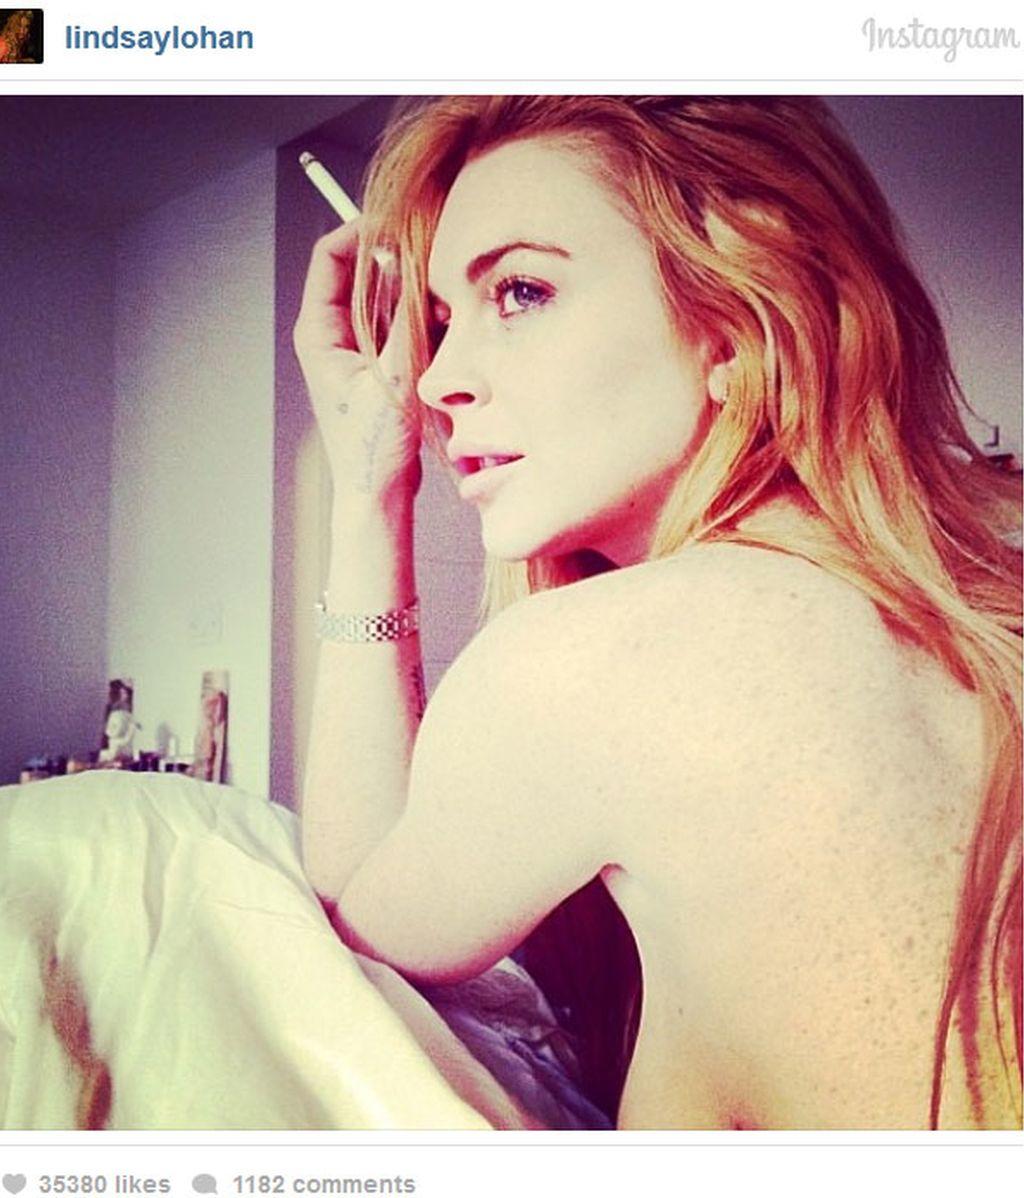 Lindsay Lohan,Instagram,actriz,